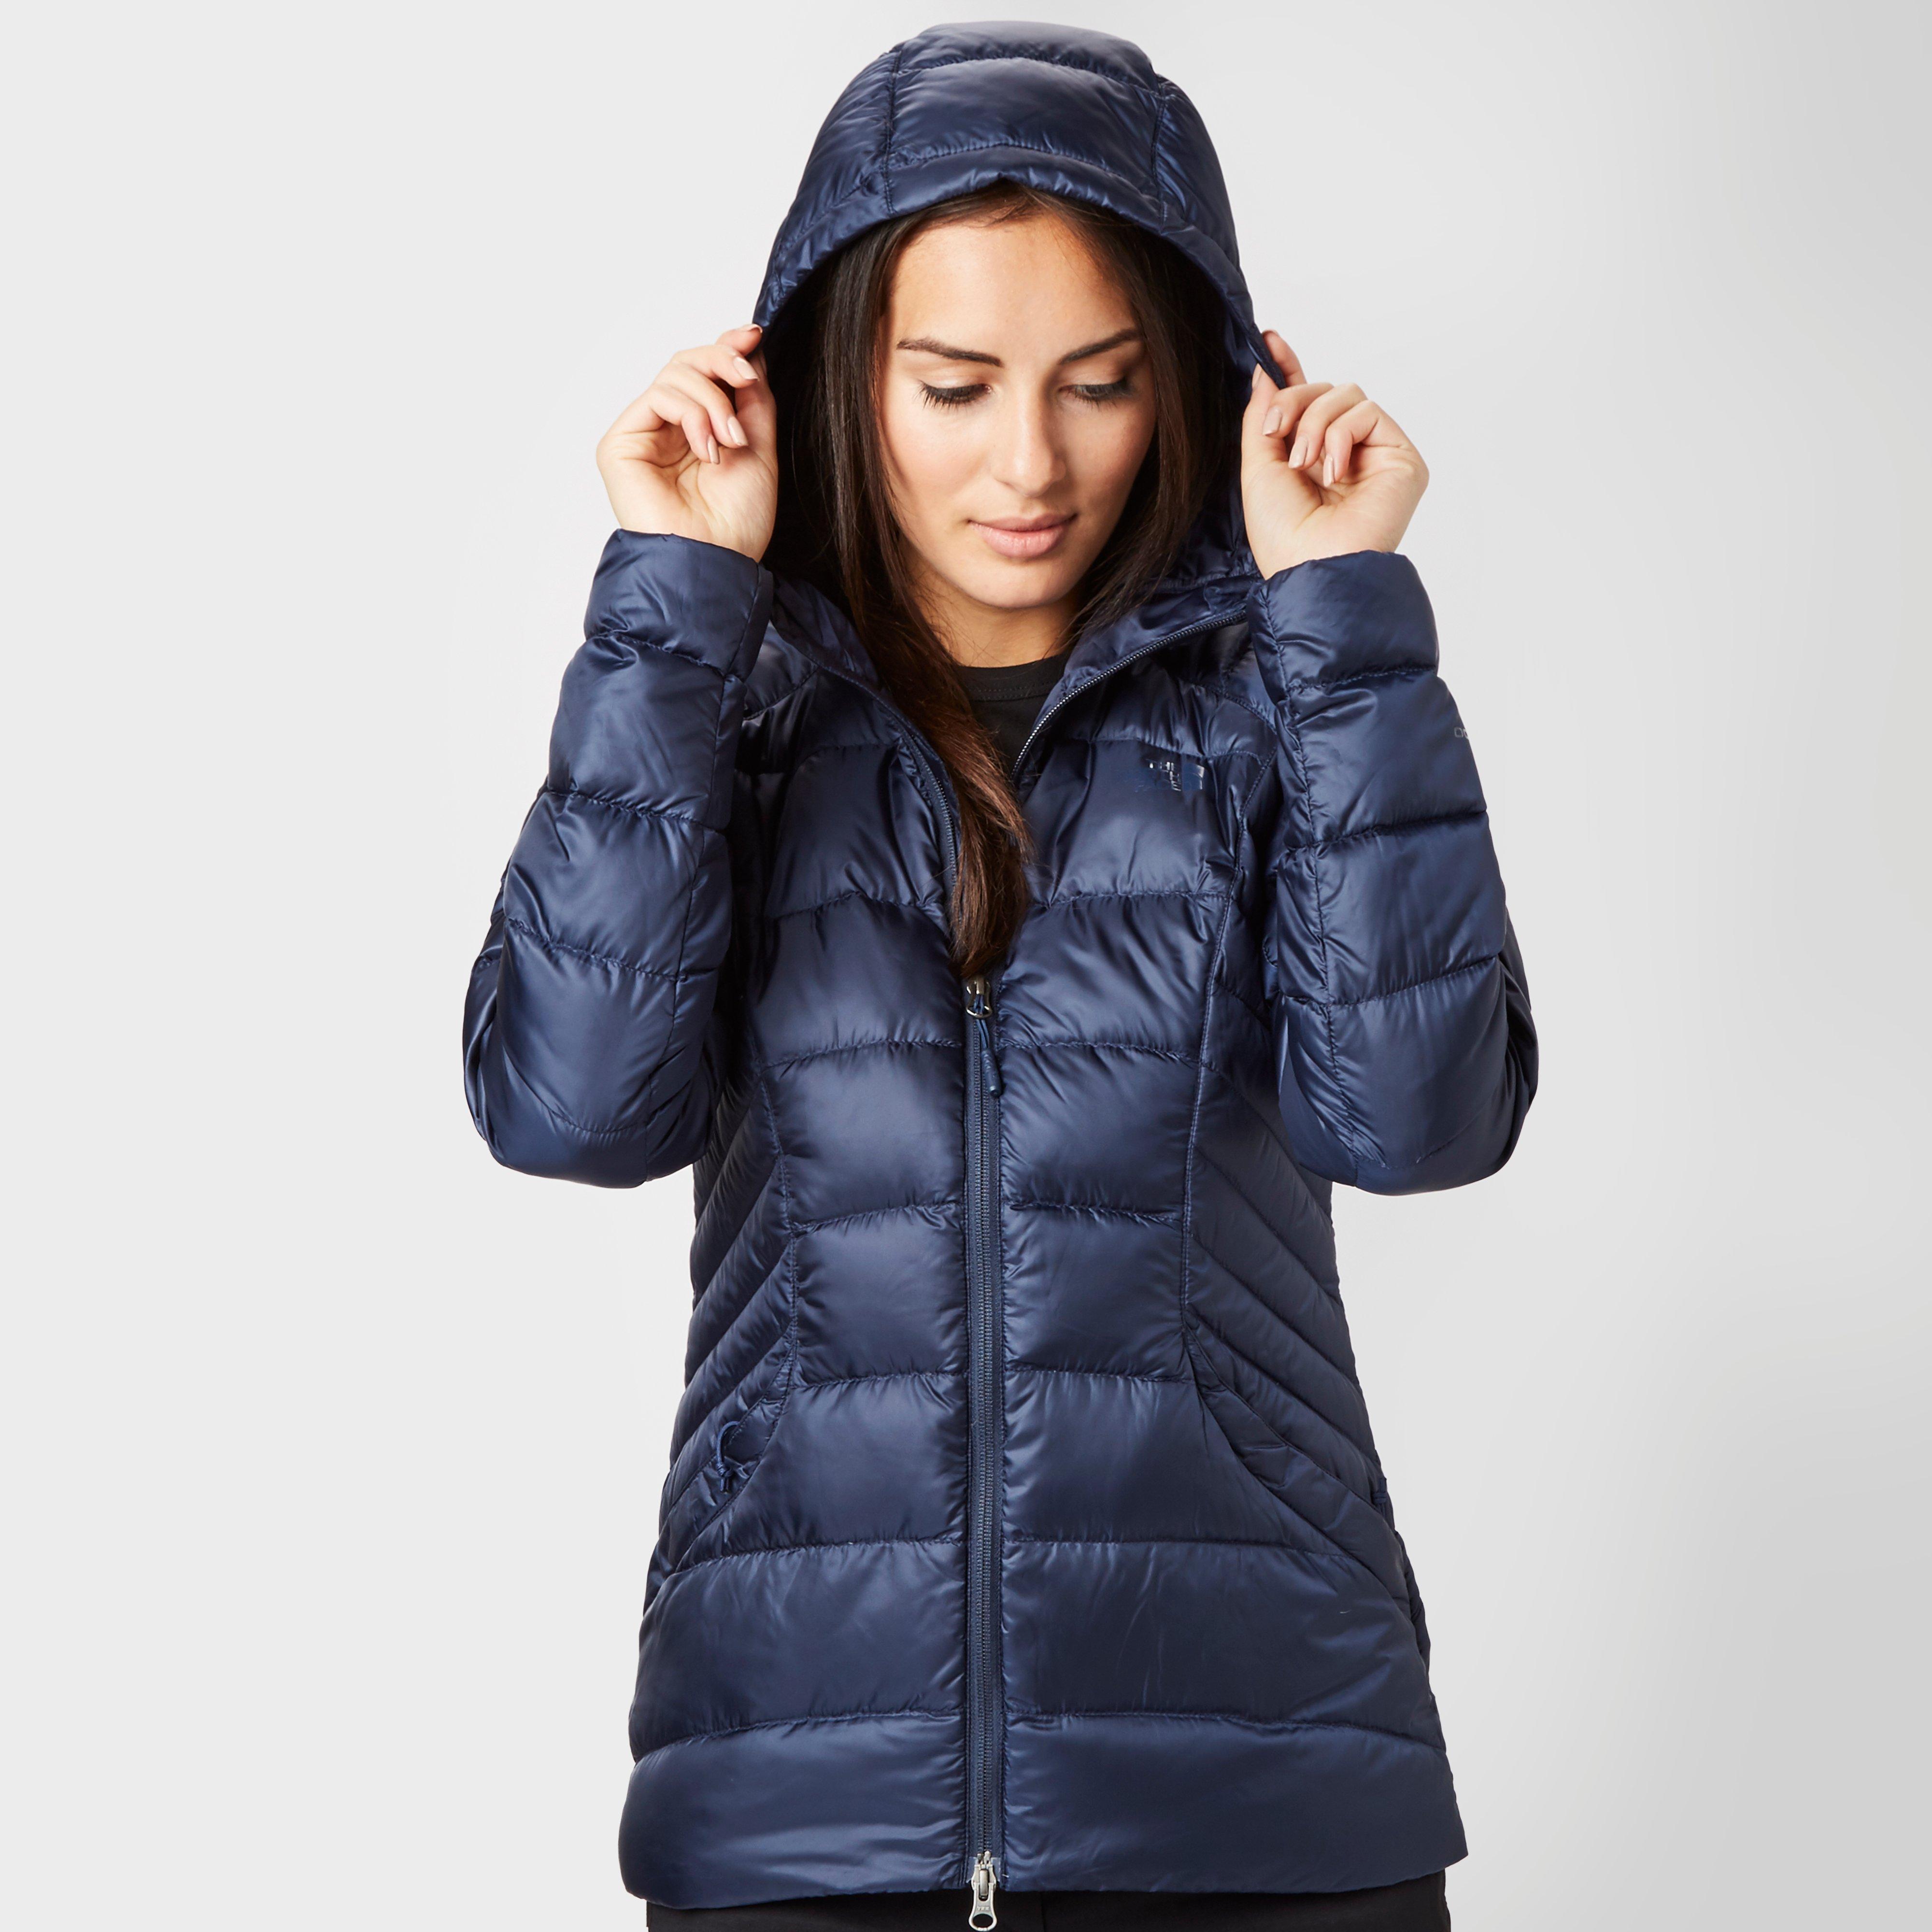 Cheap North face parka - best UK deals on Men s Sportswear to buy online c47dfced3